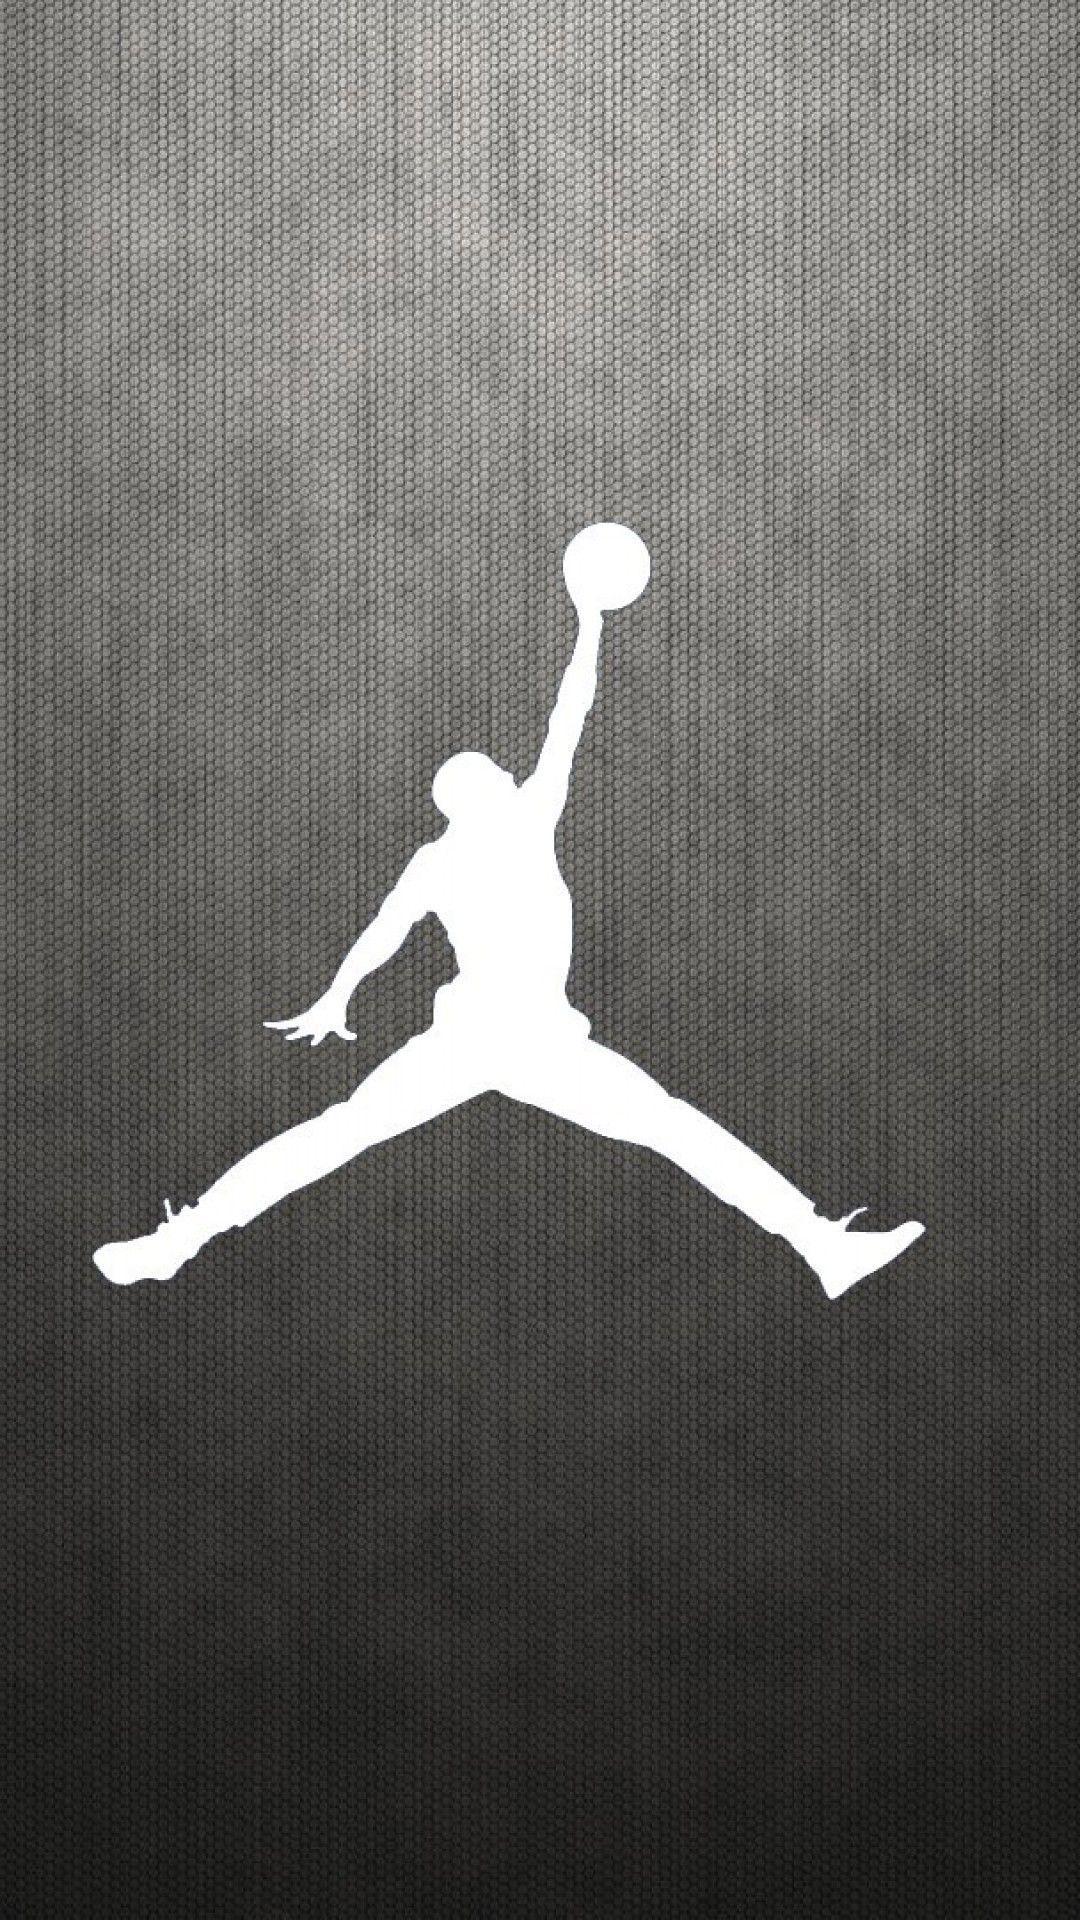 Jordan Iphone Wallpapers Top Free Jordan Iphone Backgrounds